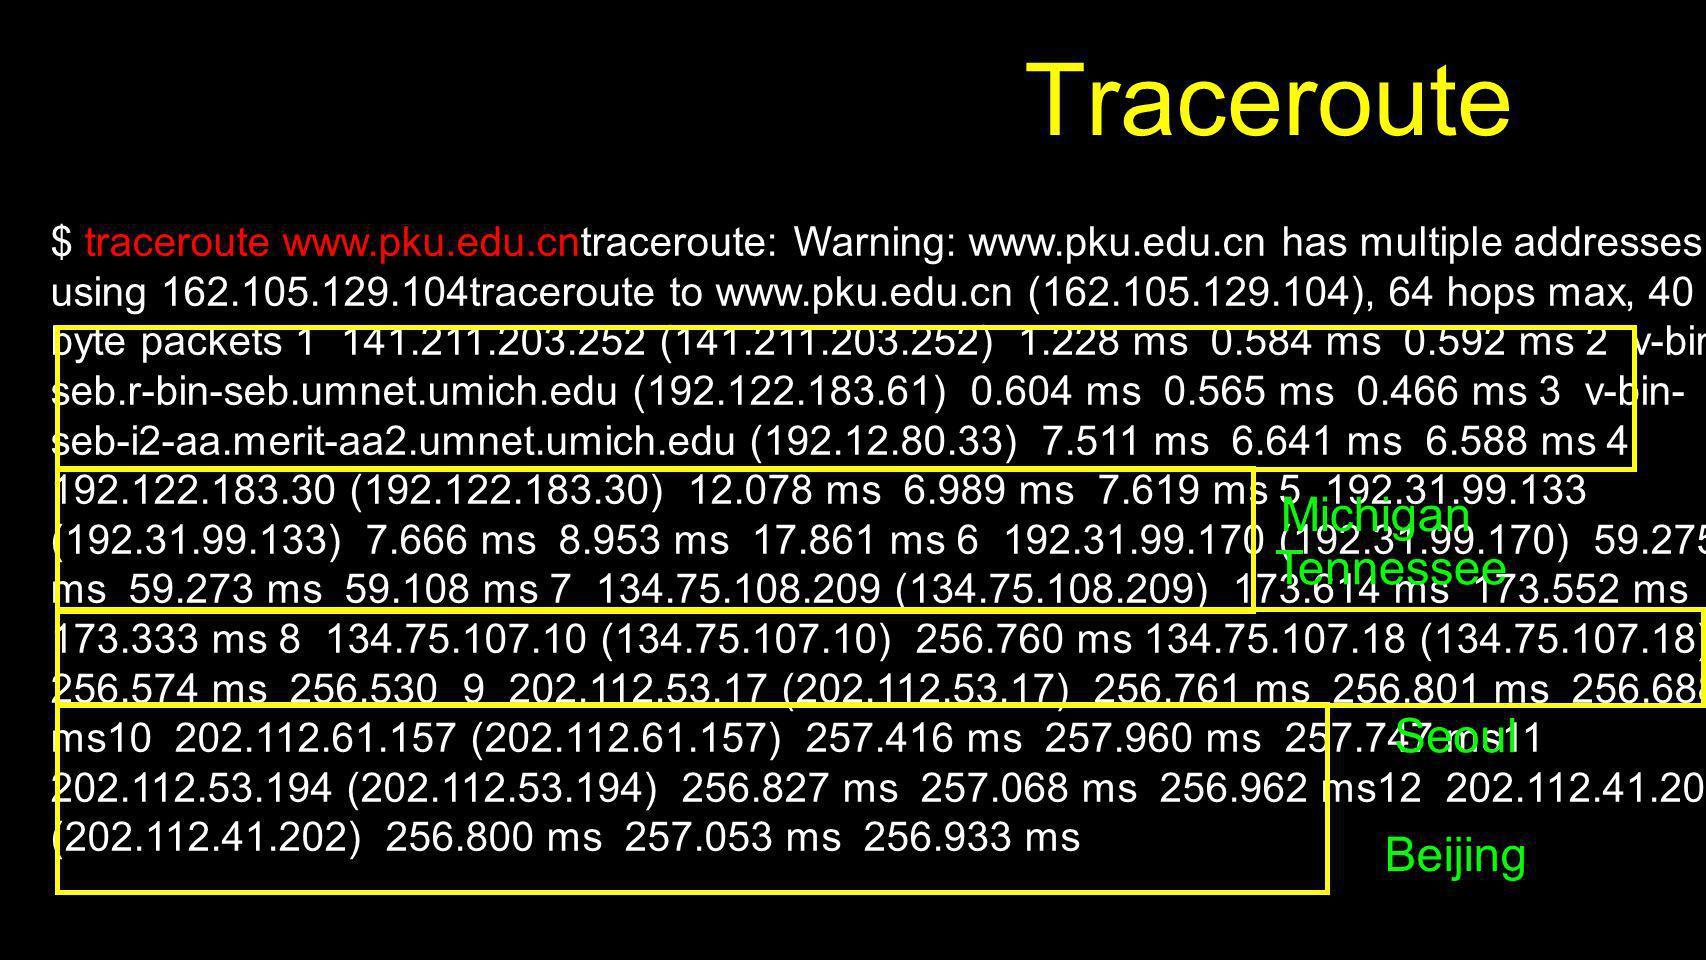 Traceroute $ traceroute www.pku.edu.cntraceroute: Warning: www.pku.edu.cn has multiple addresses; using 162.105.129.104traceroute to www.pku.edu.cn (1